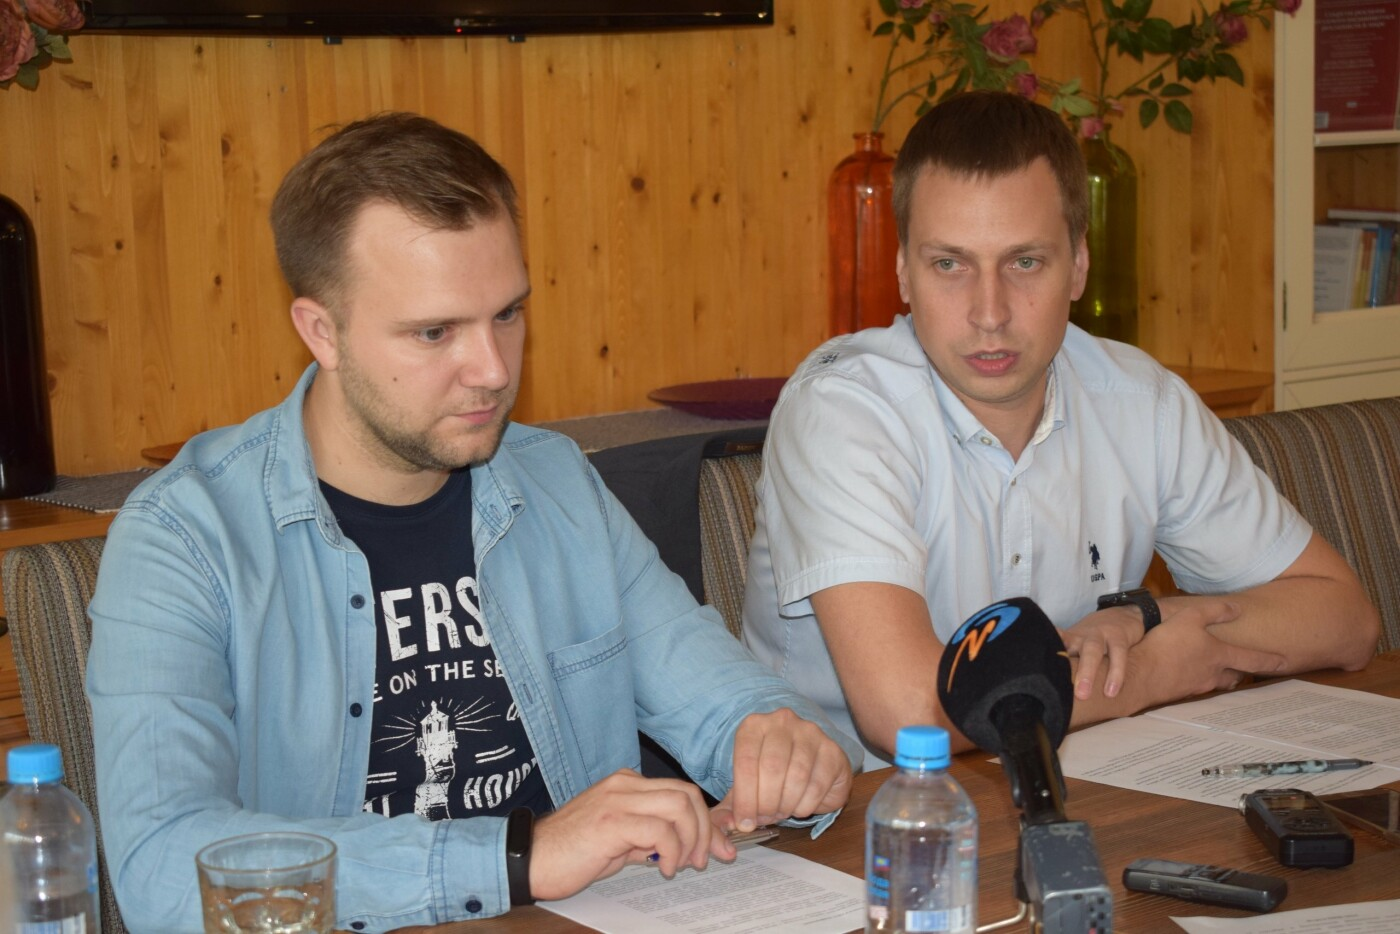 Белгородские власти заключат соглашение с компаниями «Яндекса», фото-1